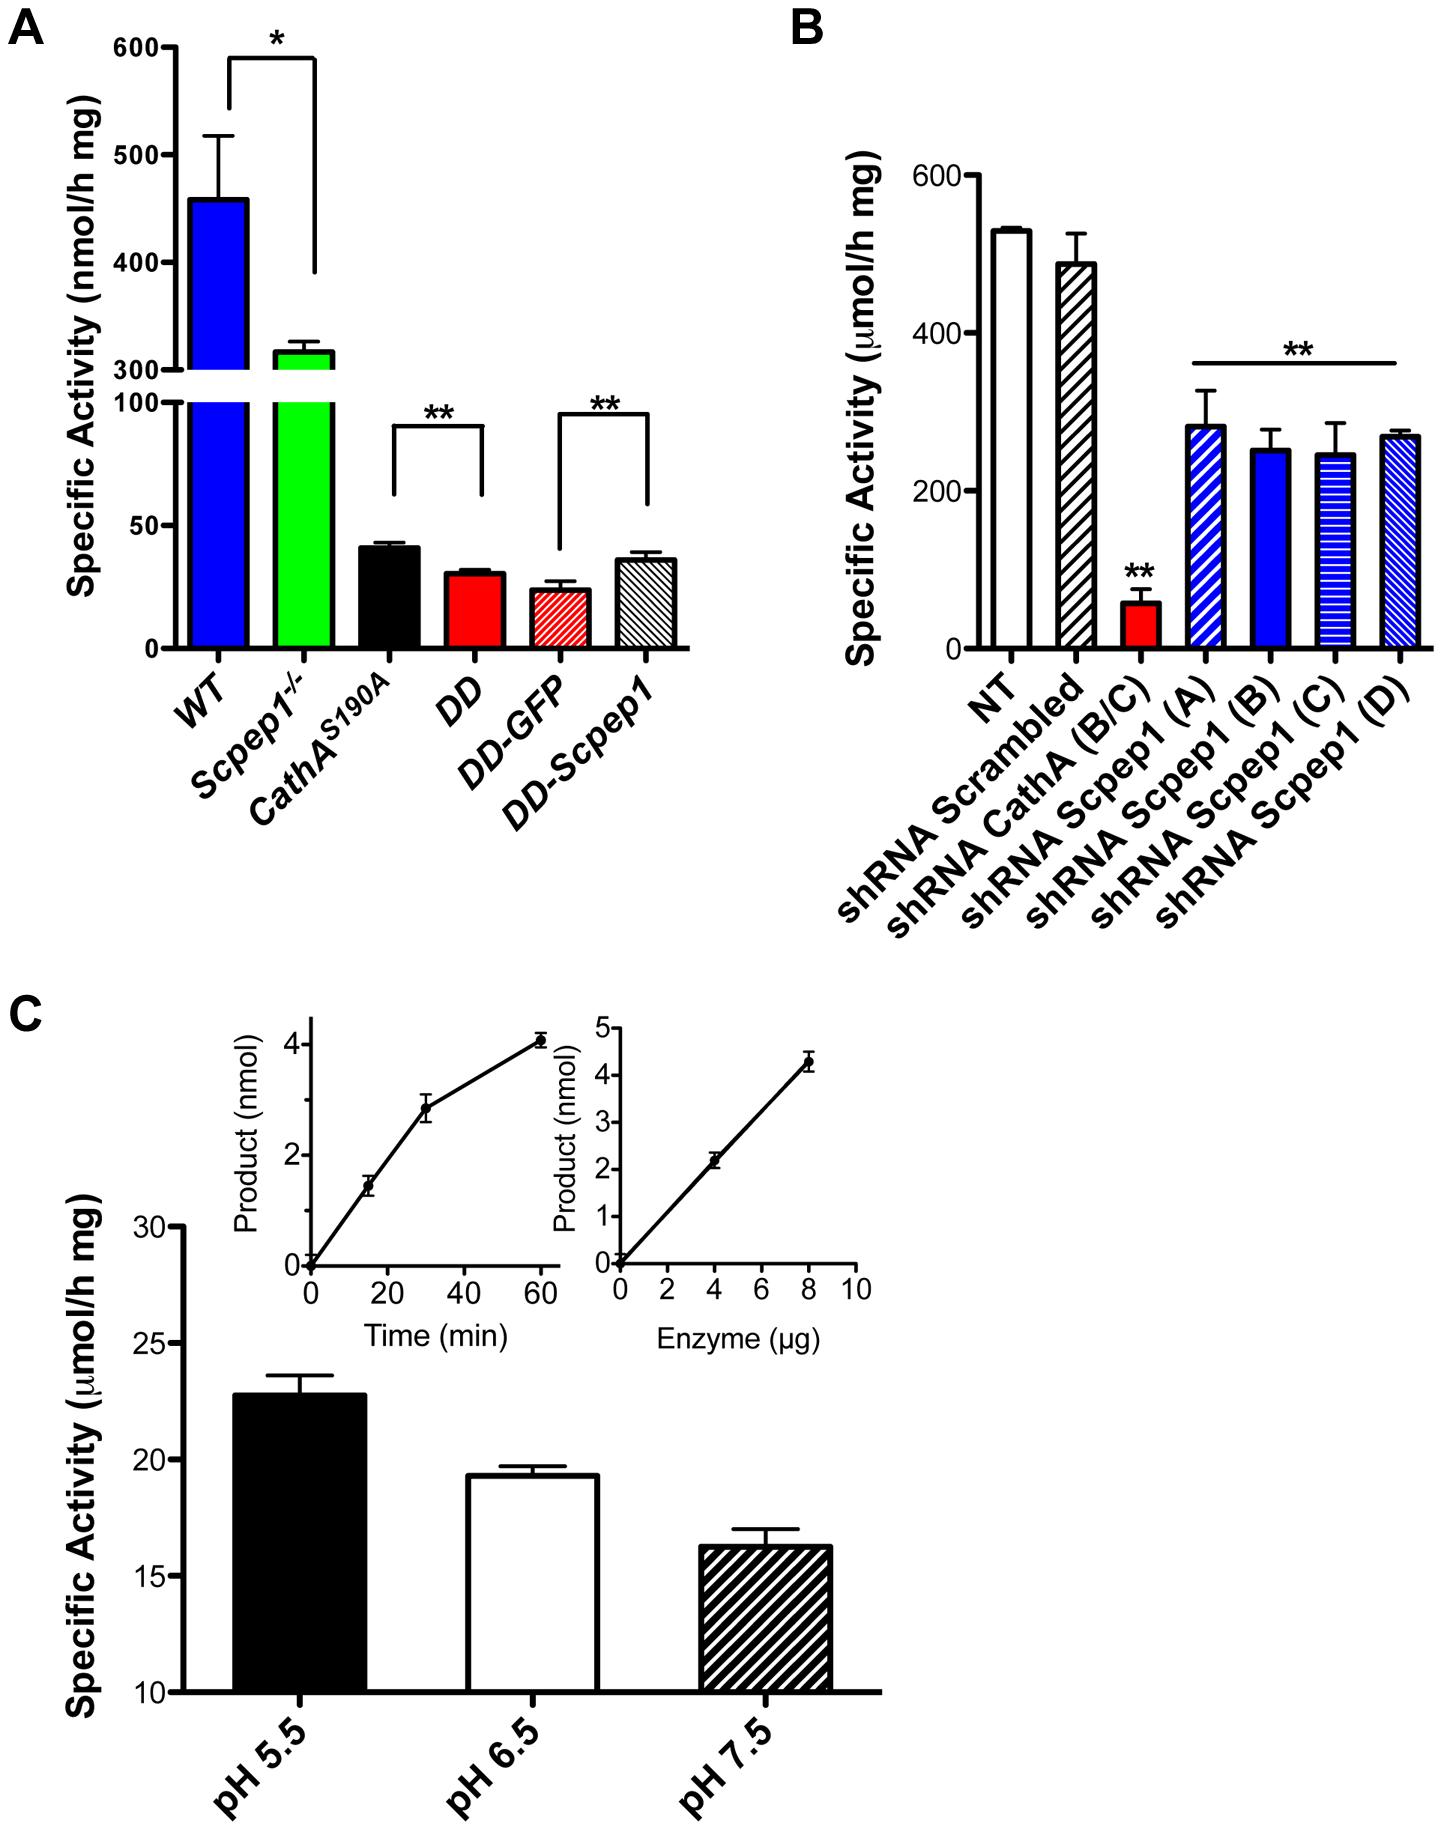 Scpep1 has carboxypeptidase activity against ET-1.